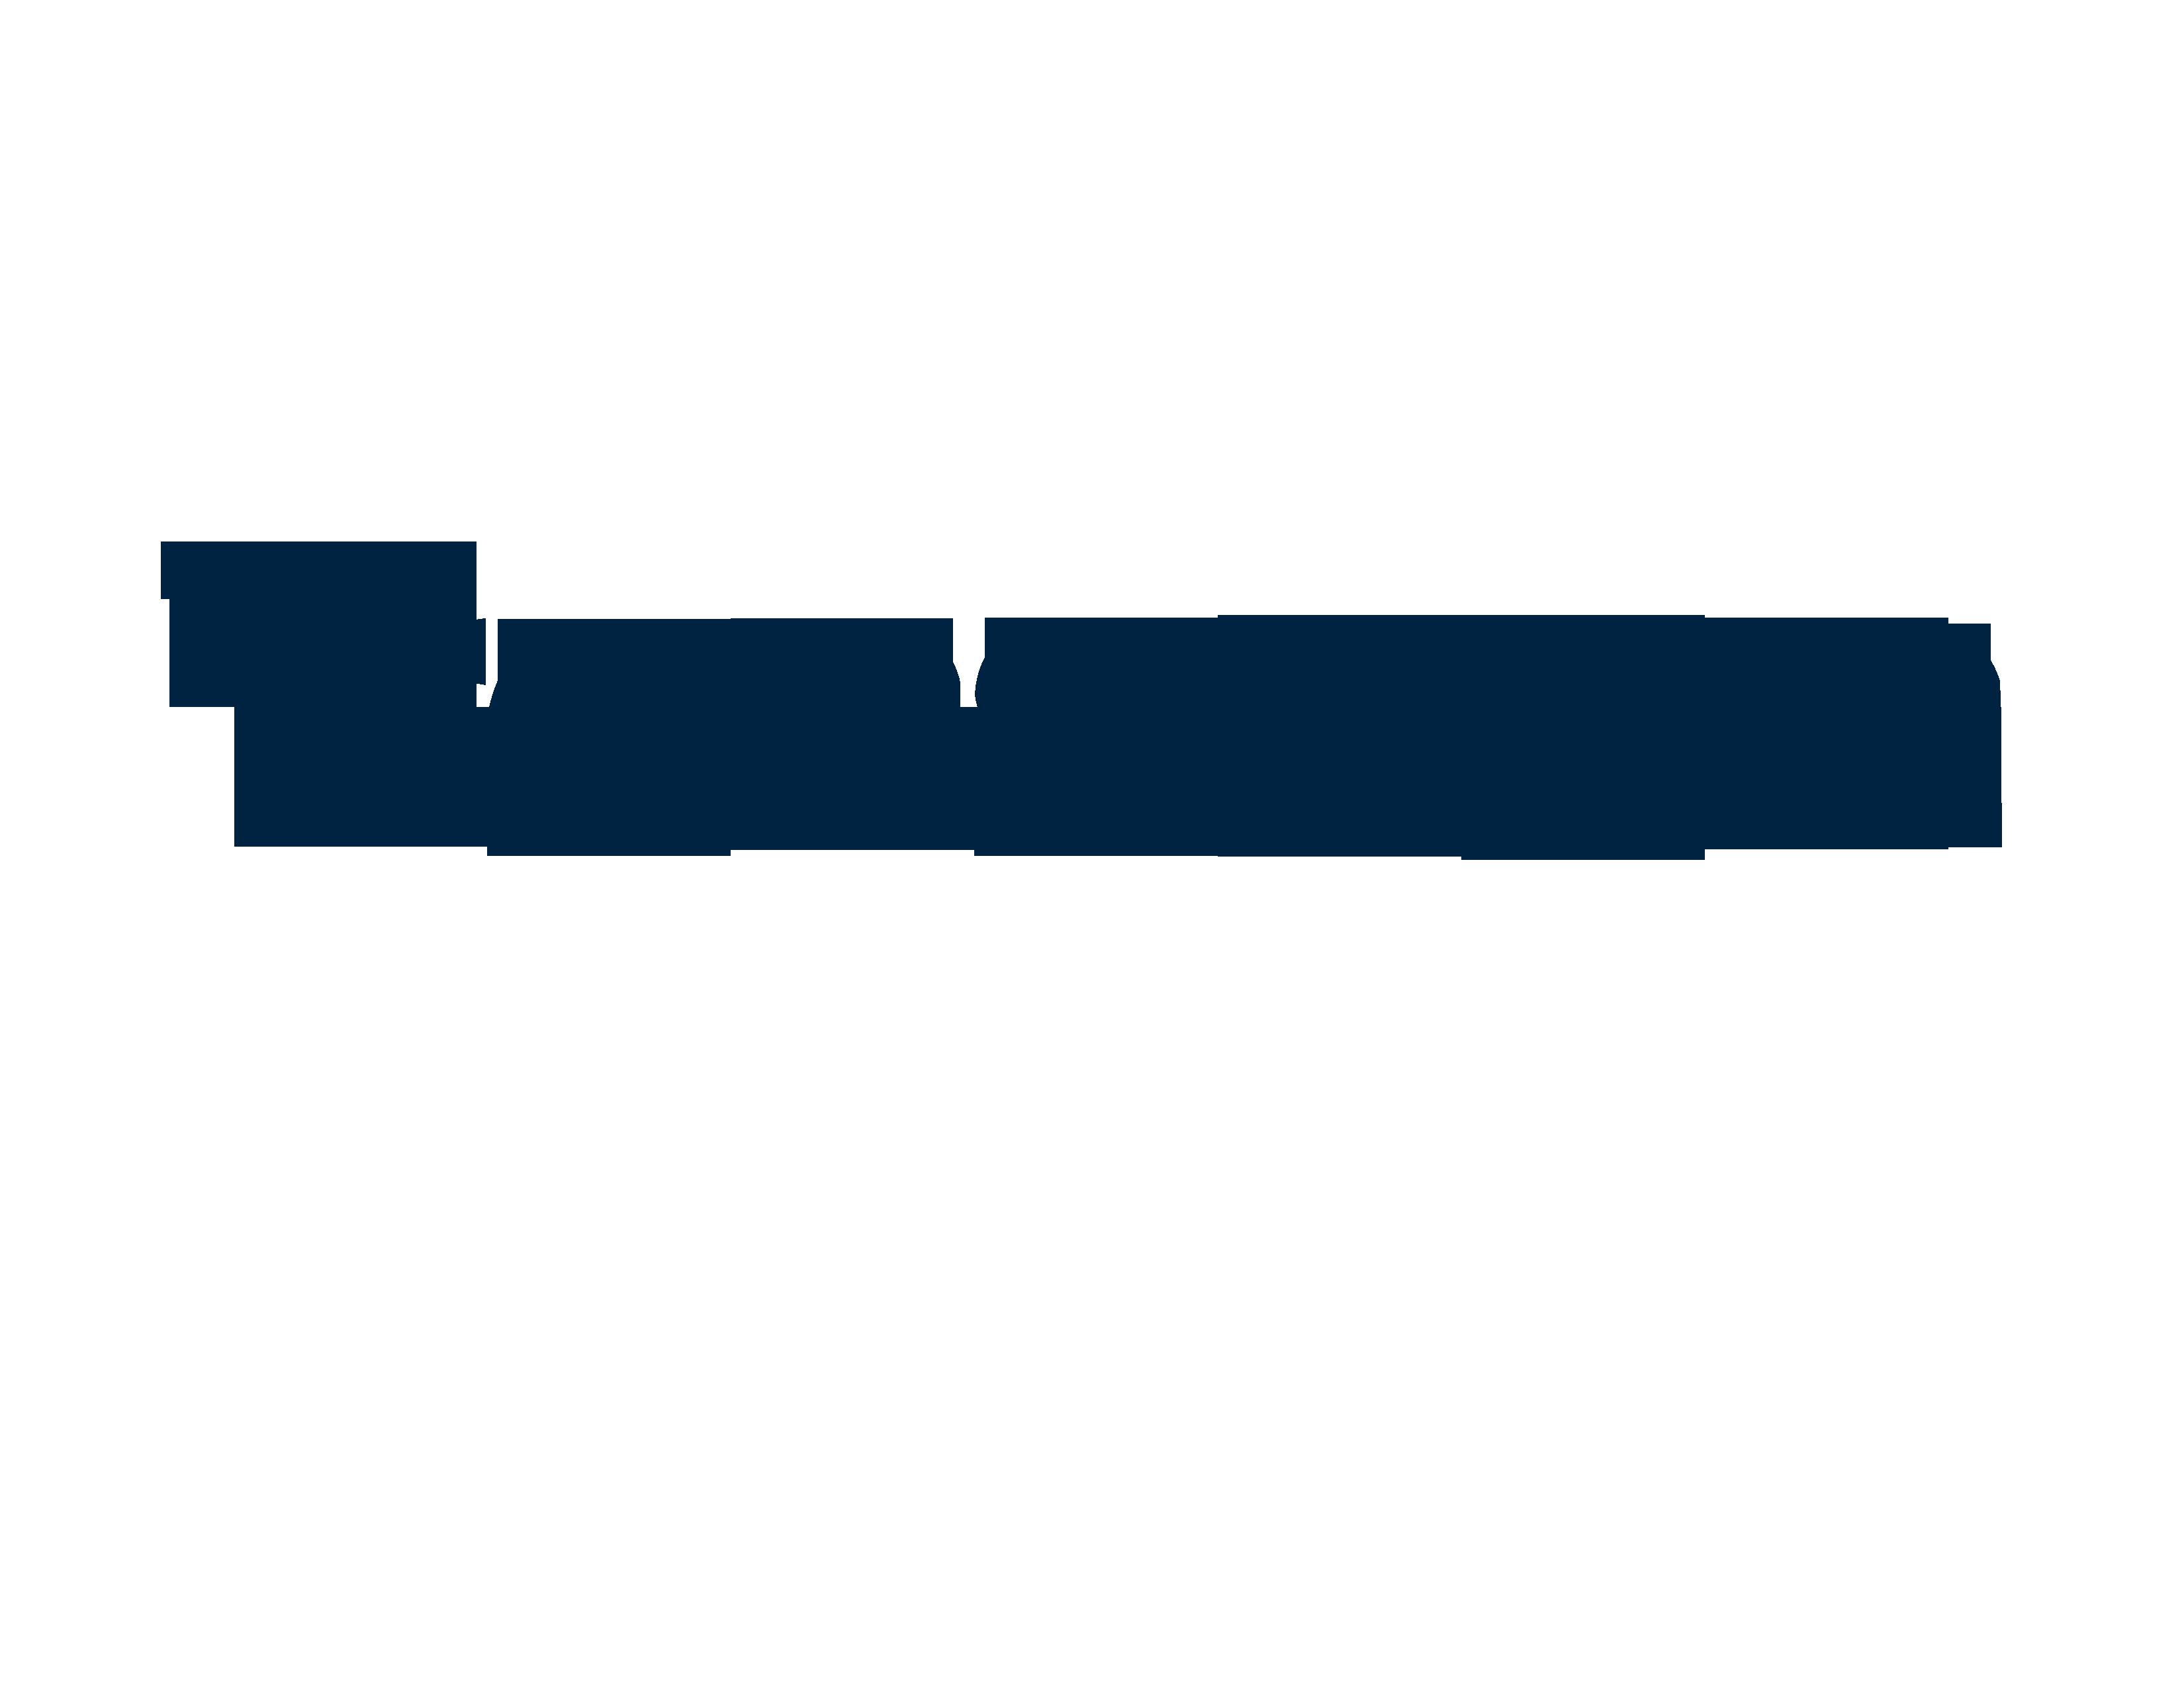 transcom-logo---dark-blue_1476865262